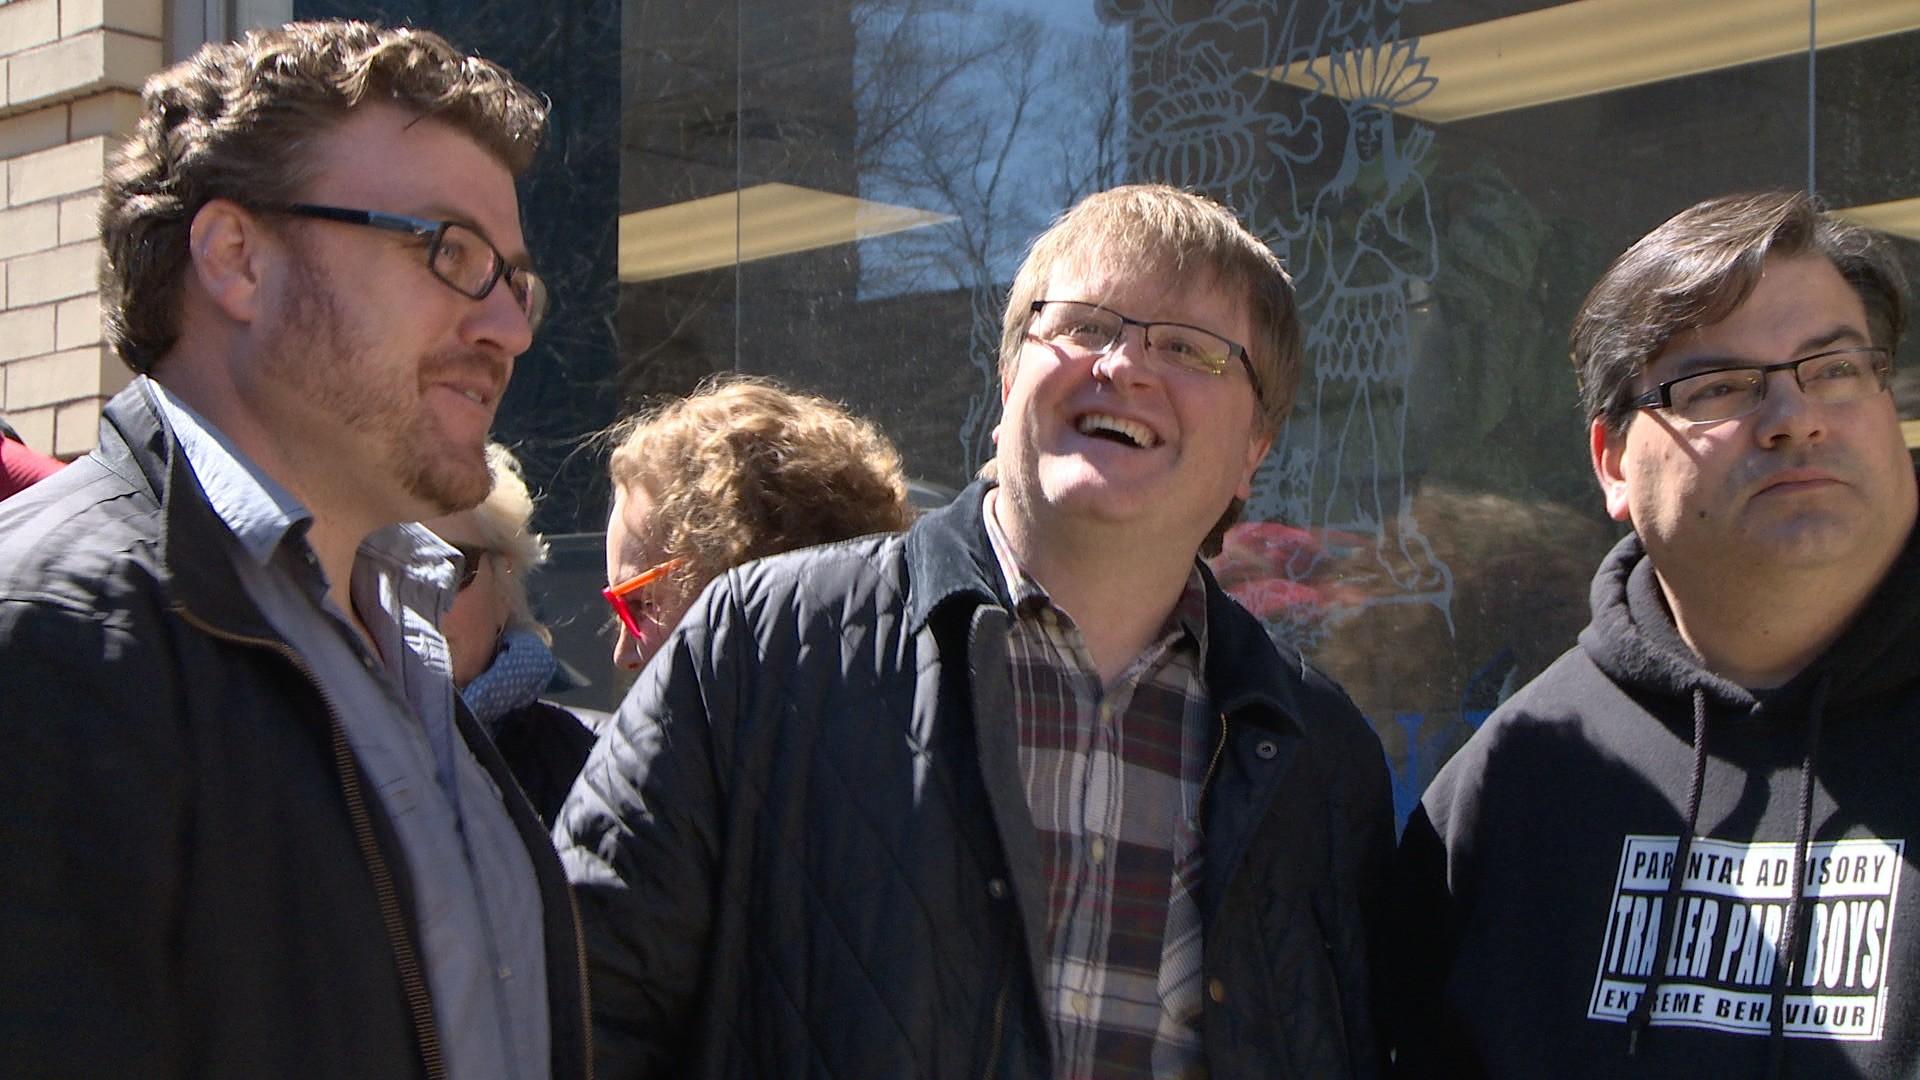 … Trailer Park Boys at rally to save Nova Scotia film industry …